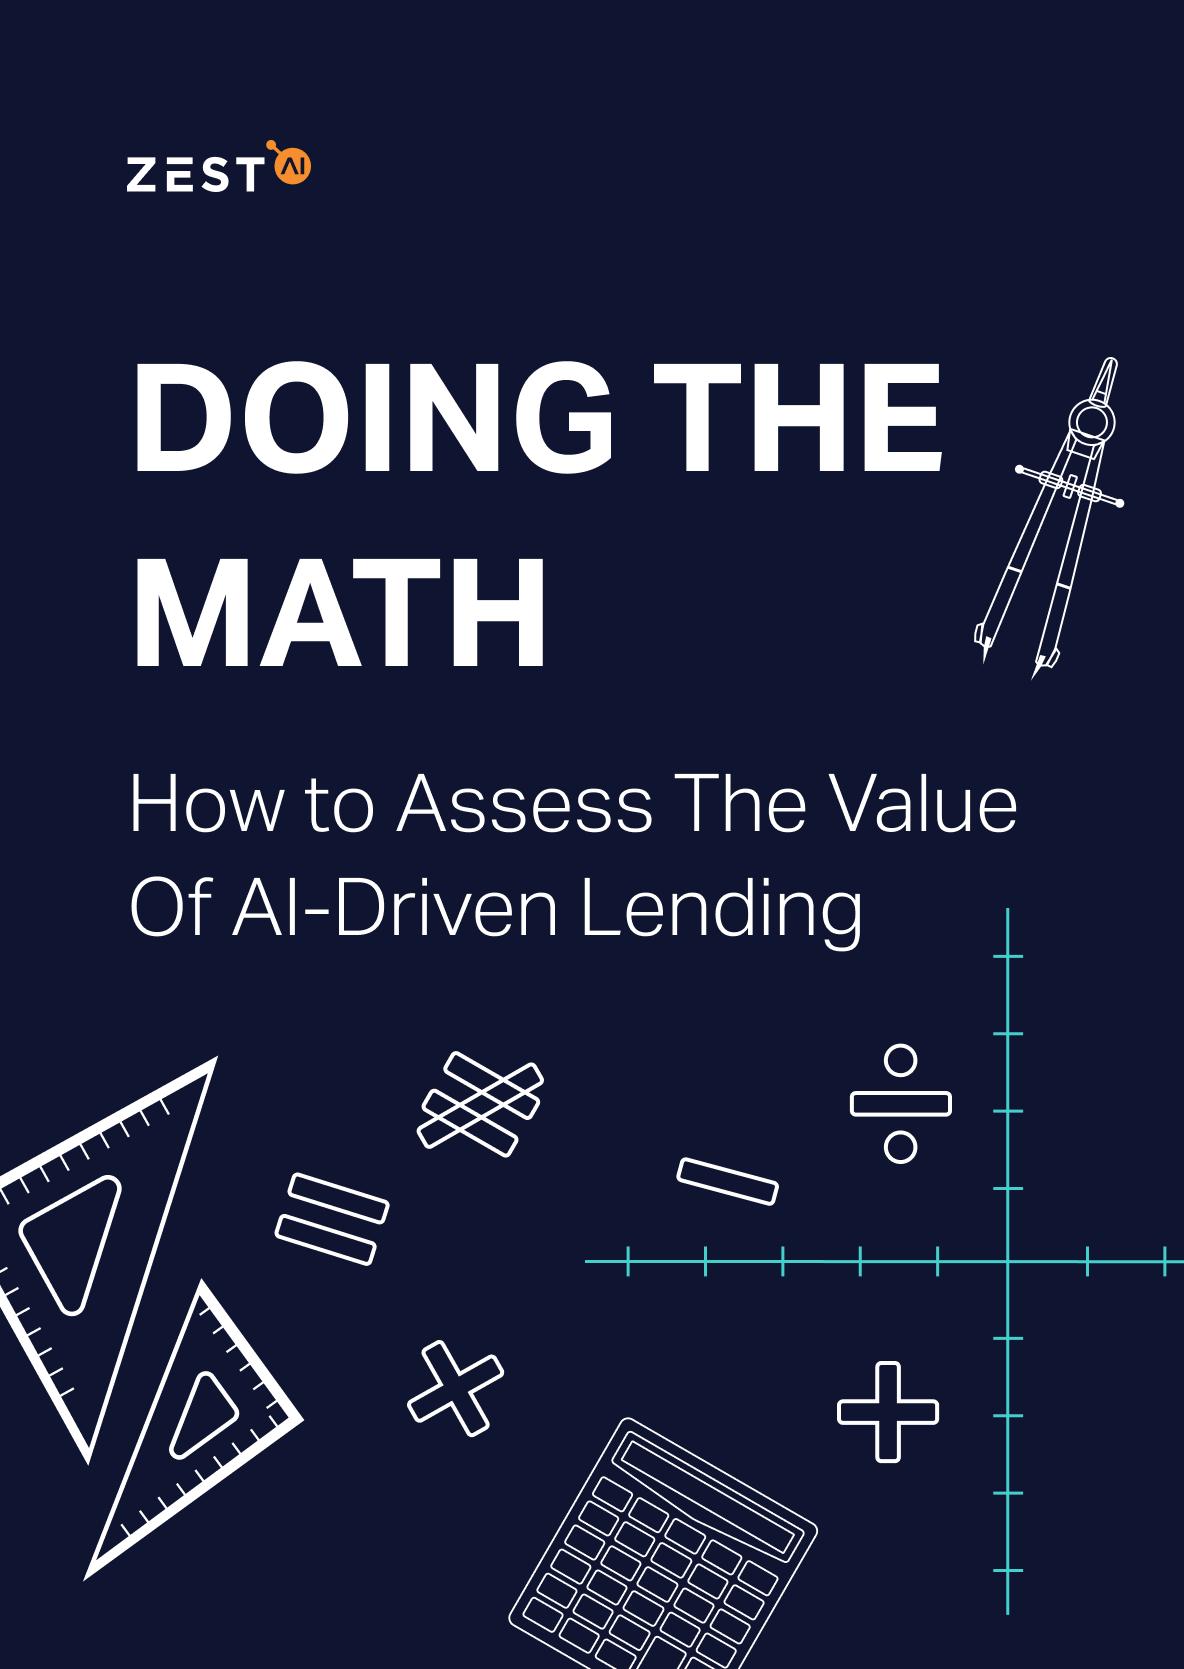 Doing the math guide to AI driven lending